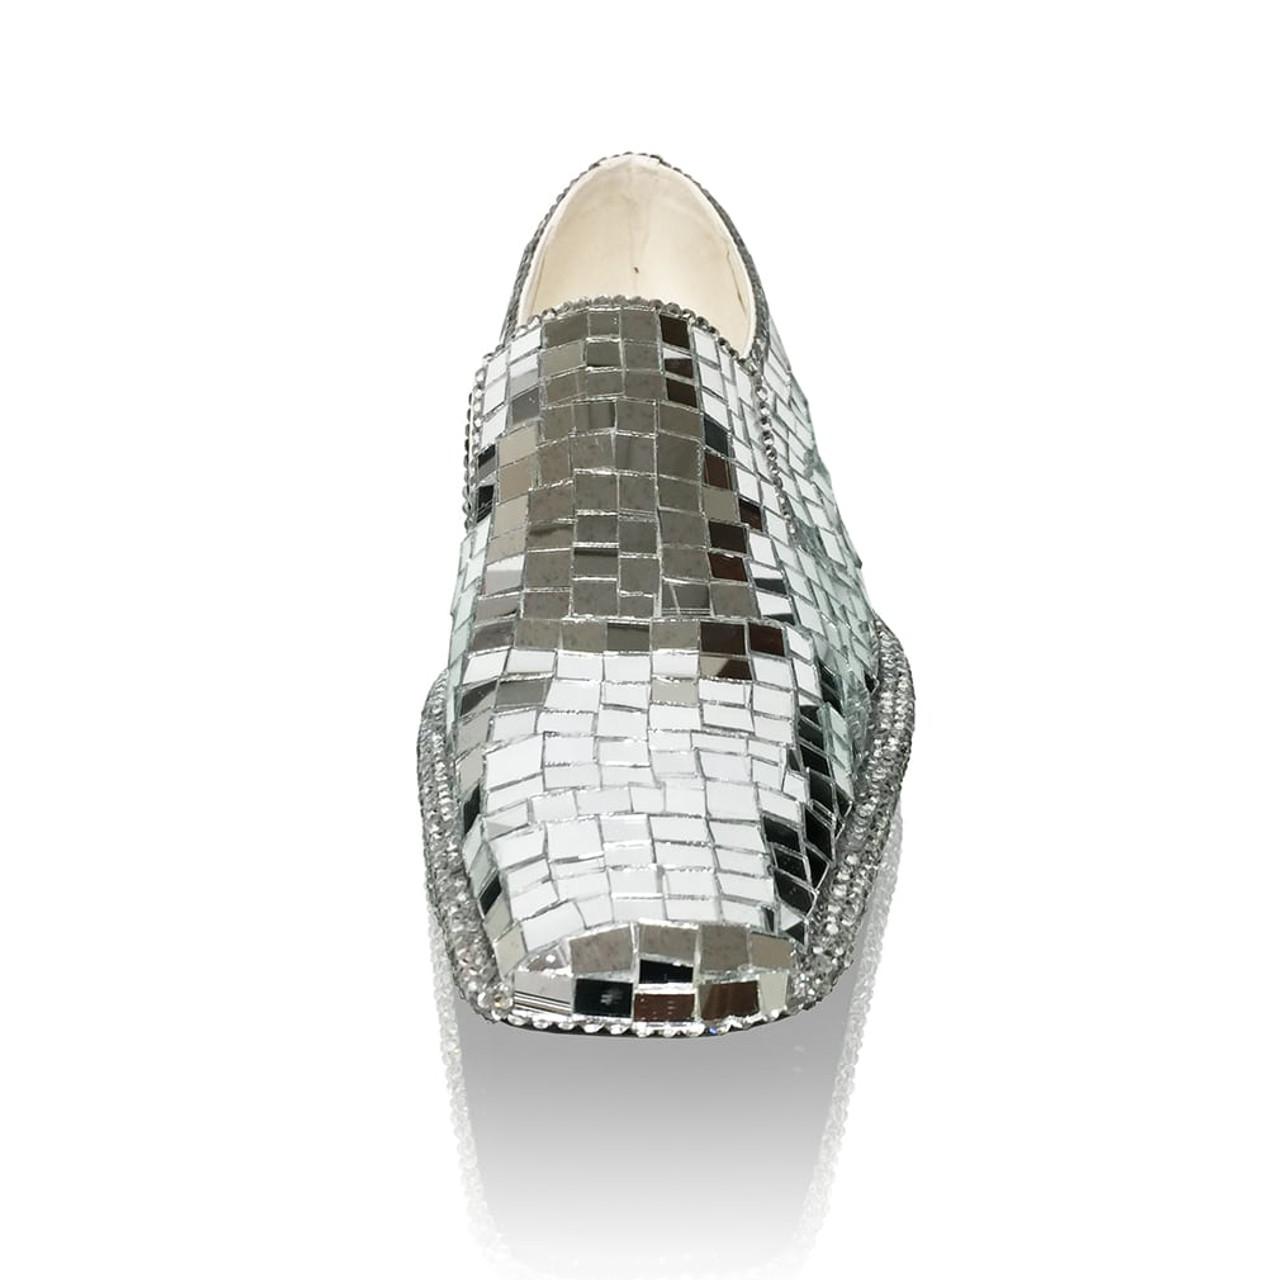 David Bondarchuck - Mirror Loafers